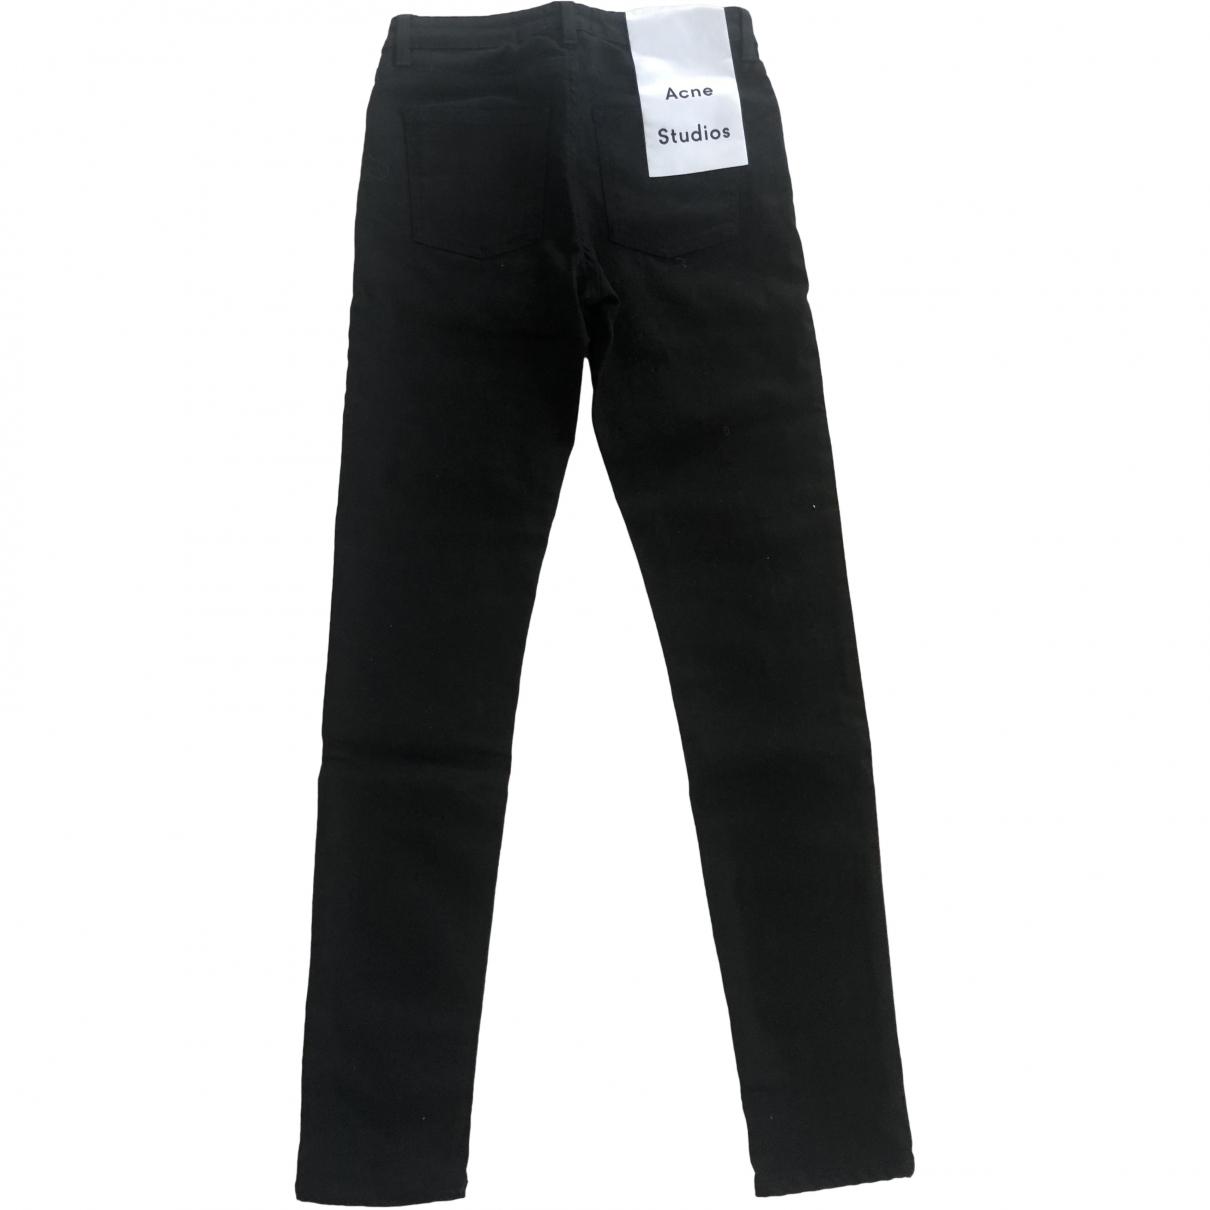 Acne Studios \N Black Denim - Jeans Trousers for Women 32 FR